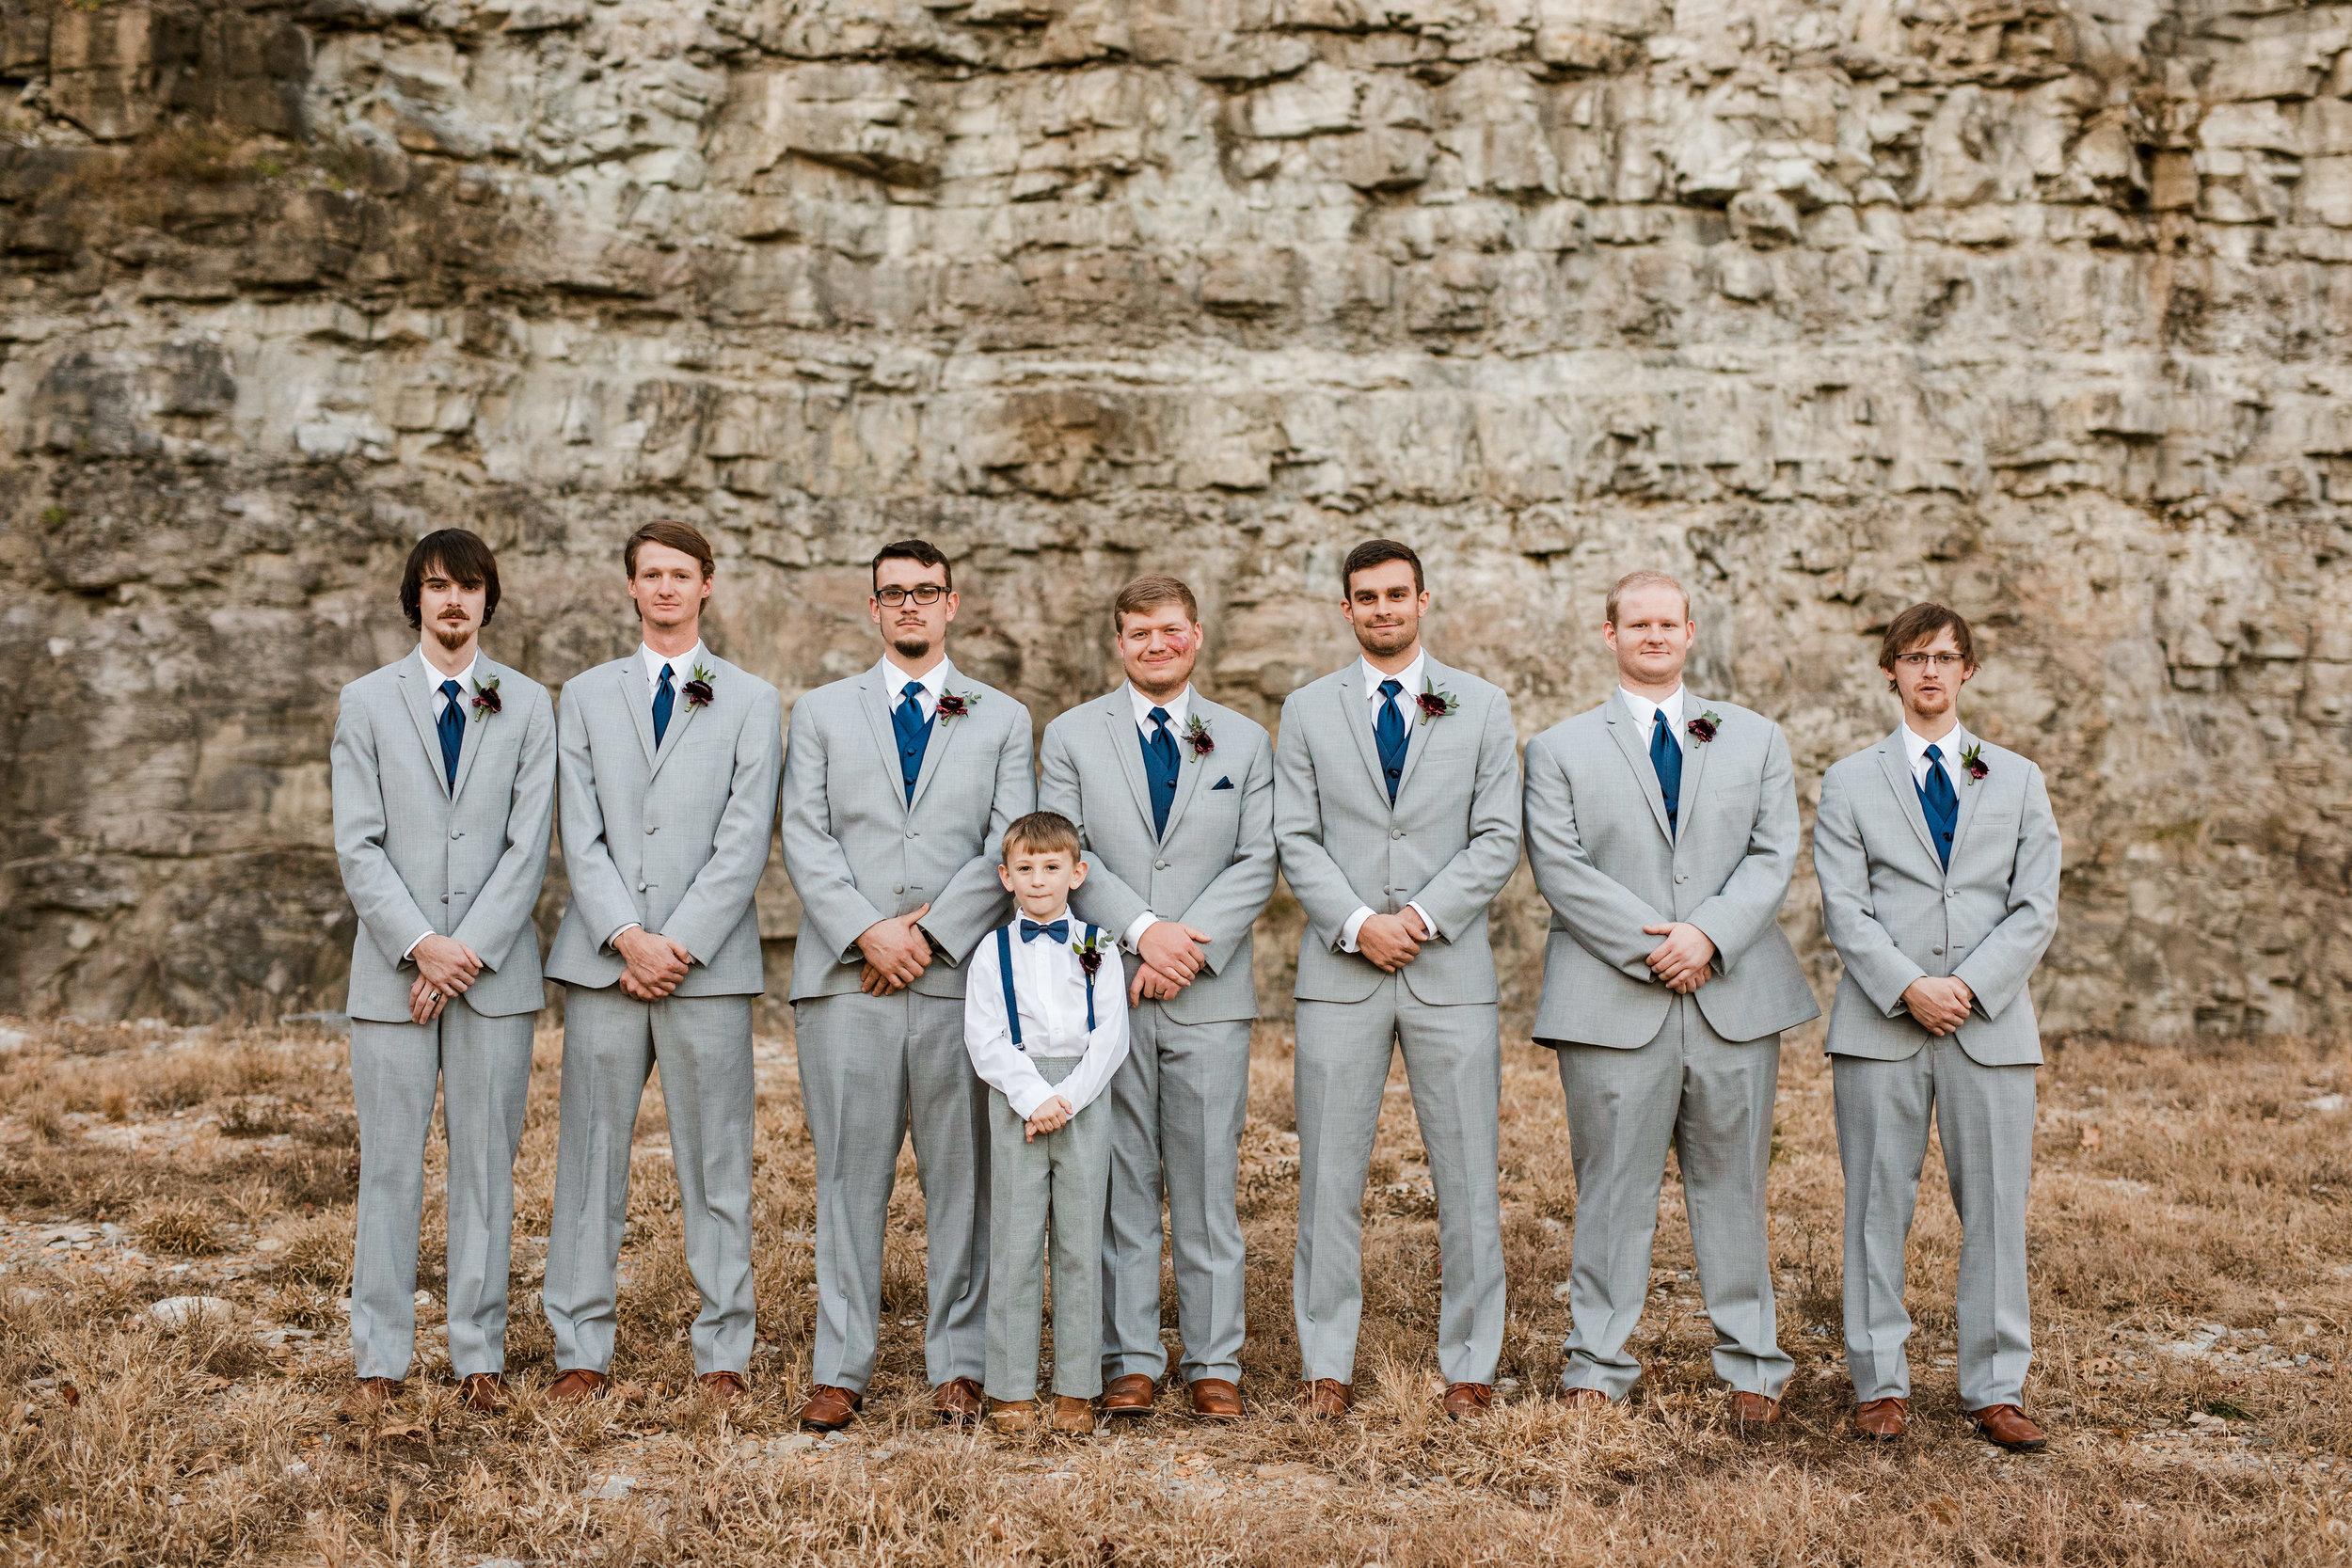 Graystone-Quarry-Wedding 60.jpg